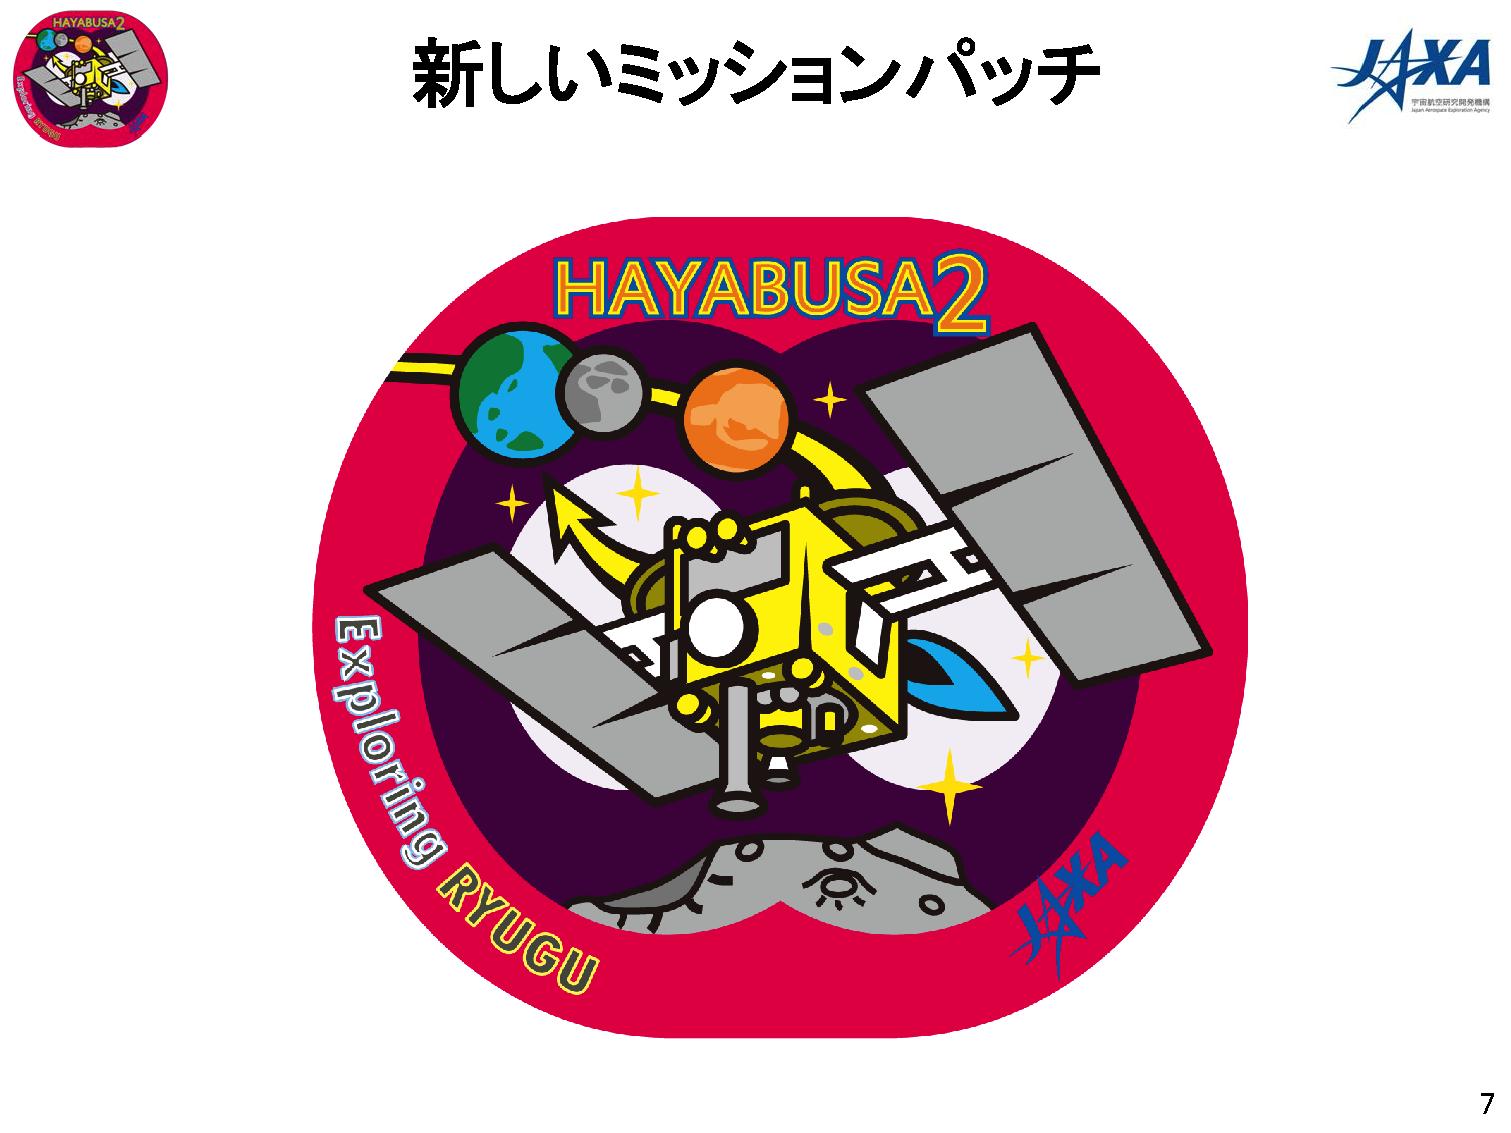 f:id:Imamura:20180627171836p:plain